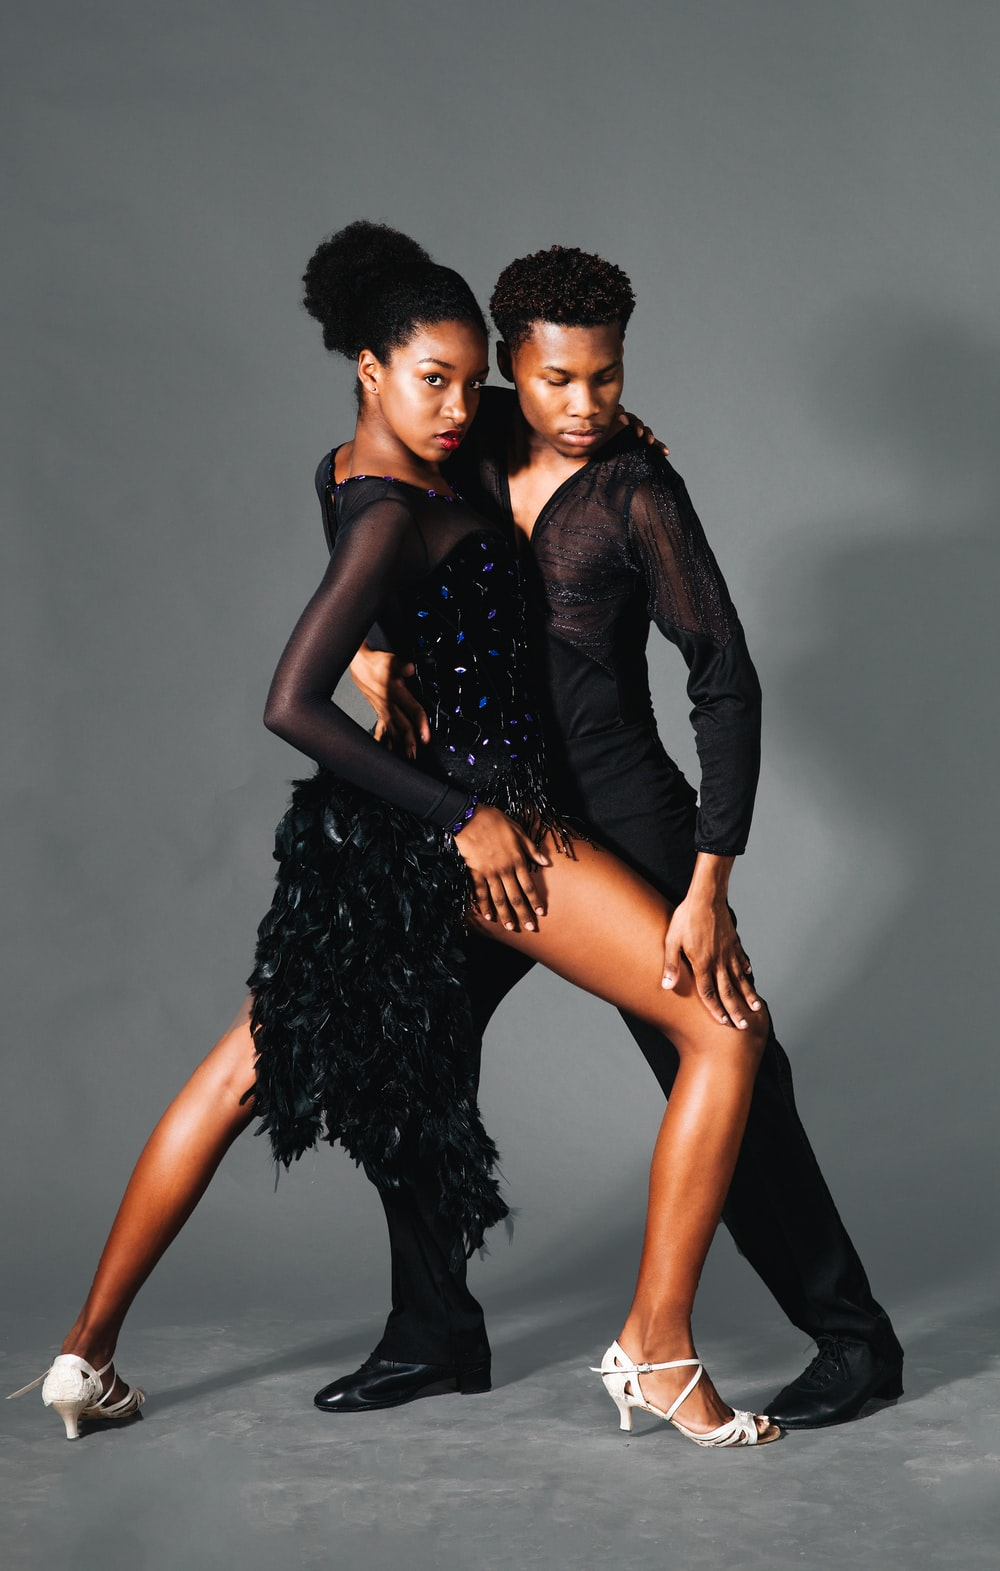 man and woman dancing photograph